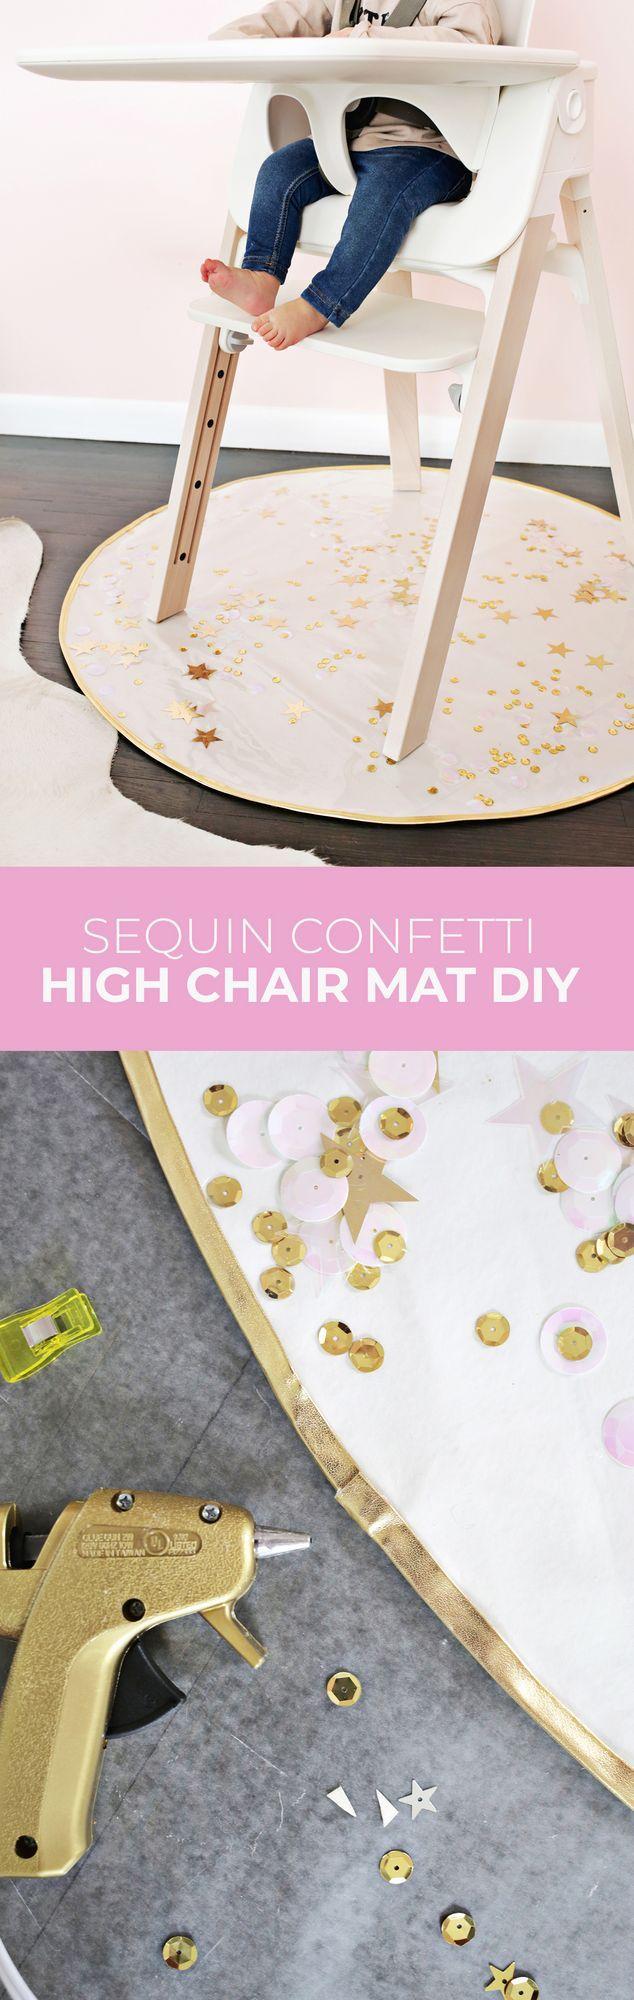 Sequin Confetti High Chair Mat DIY | A Beautiful Mess | Bloglovin'